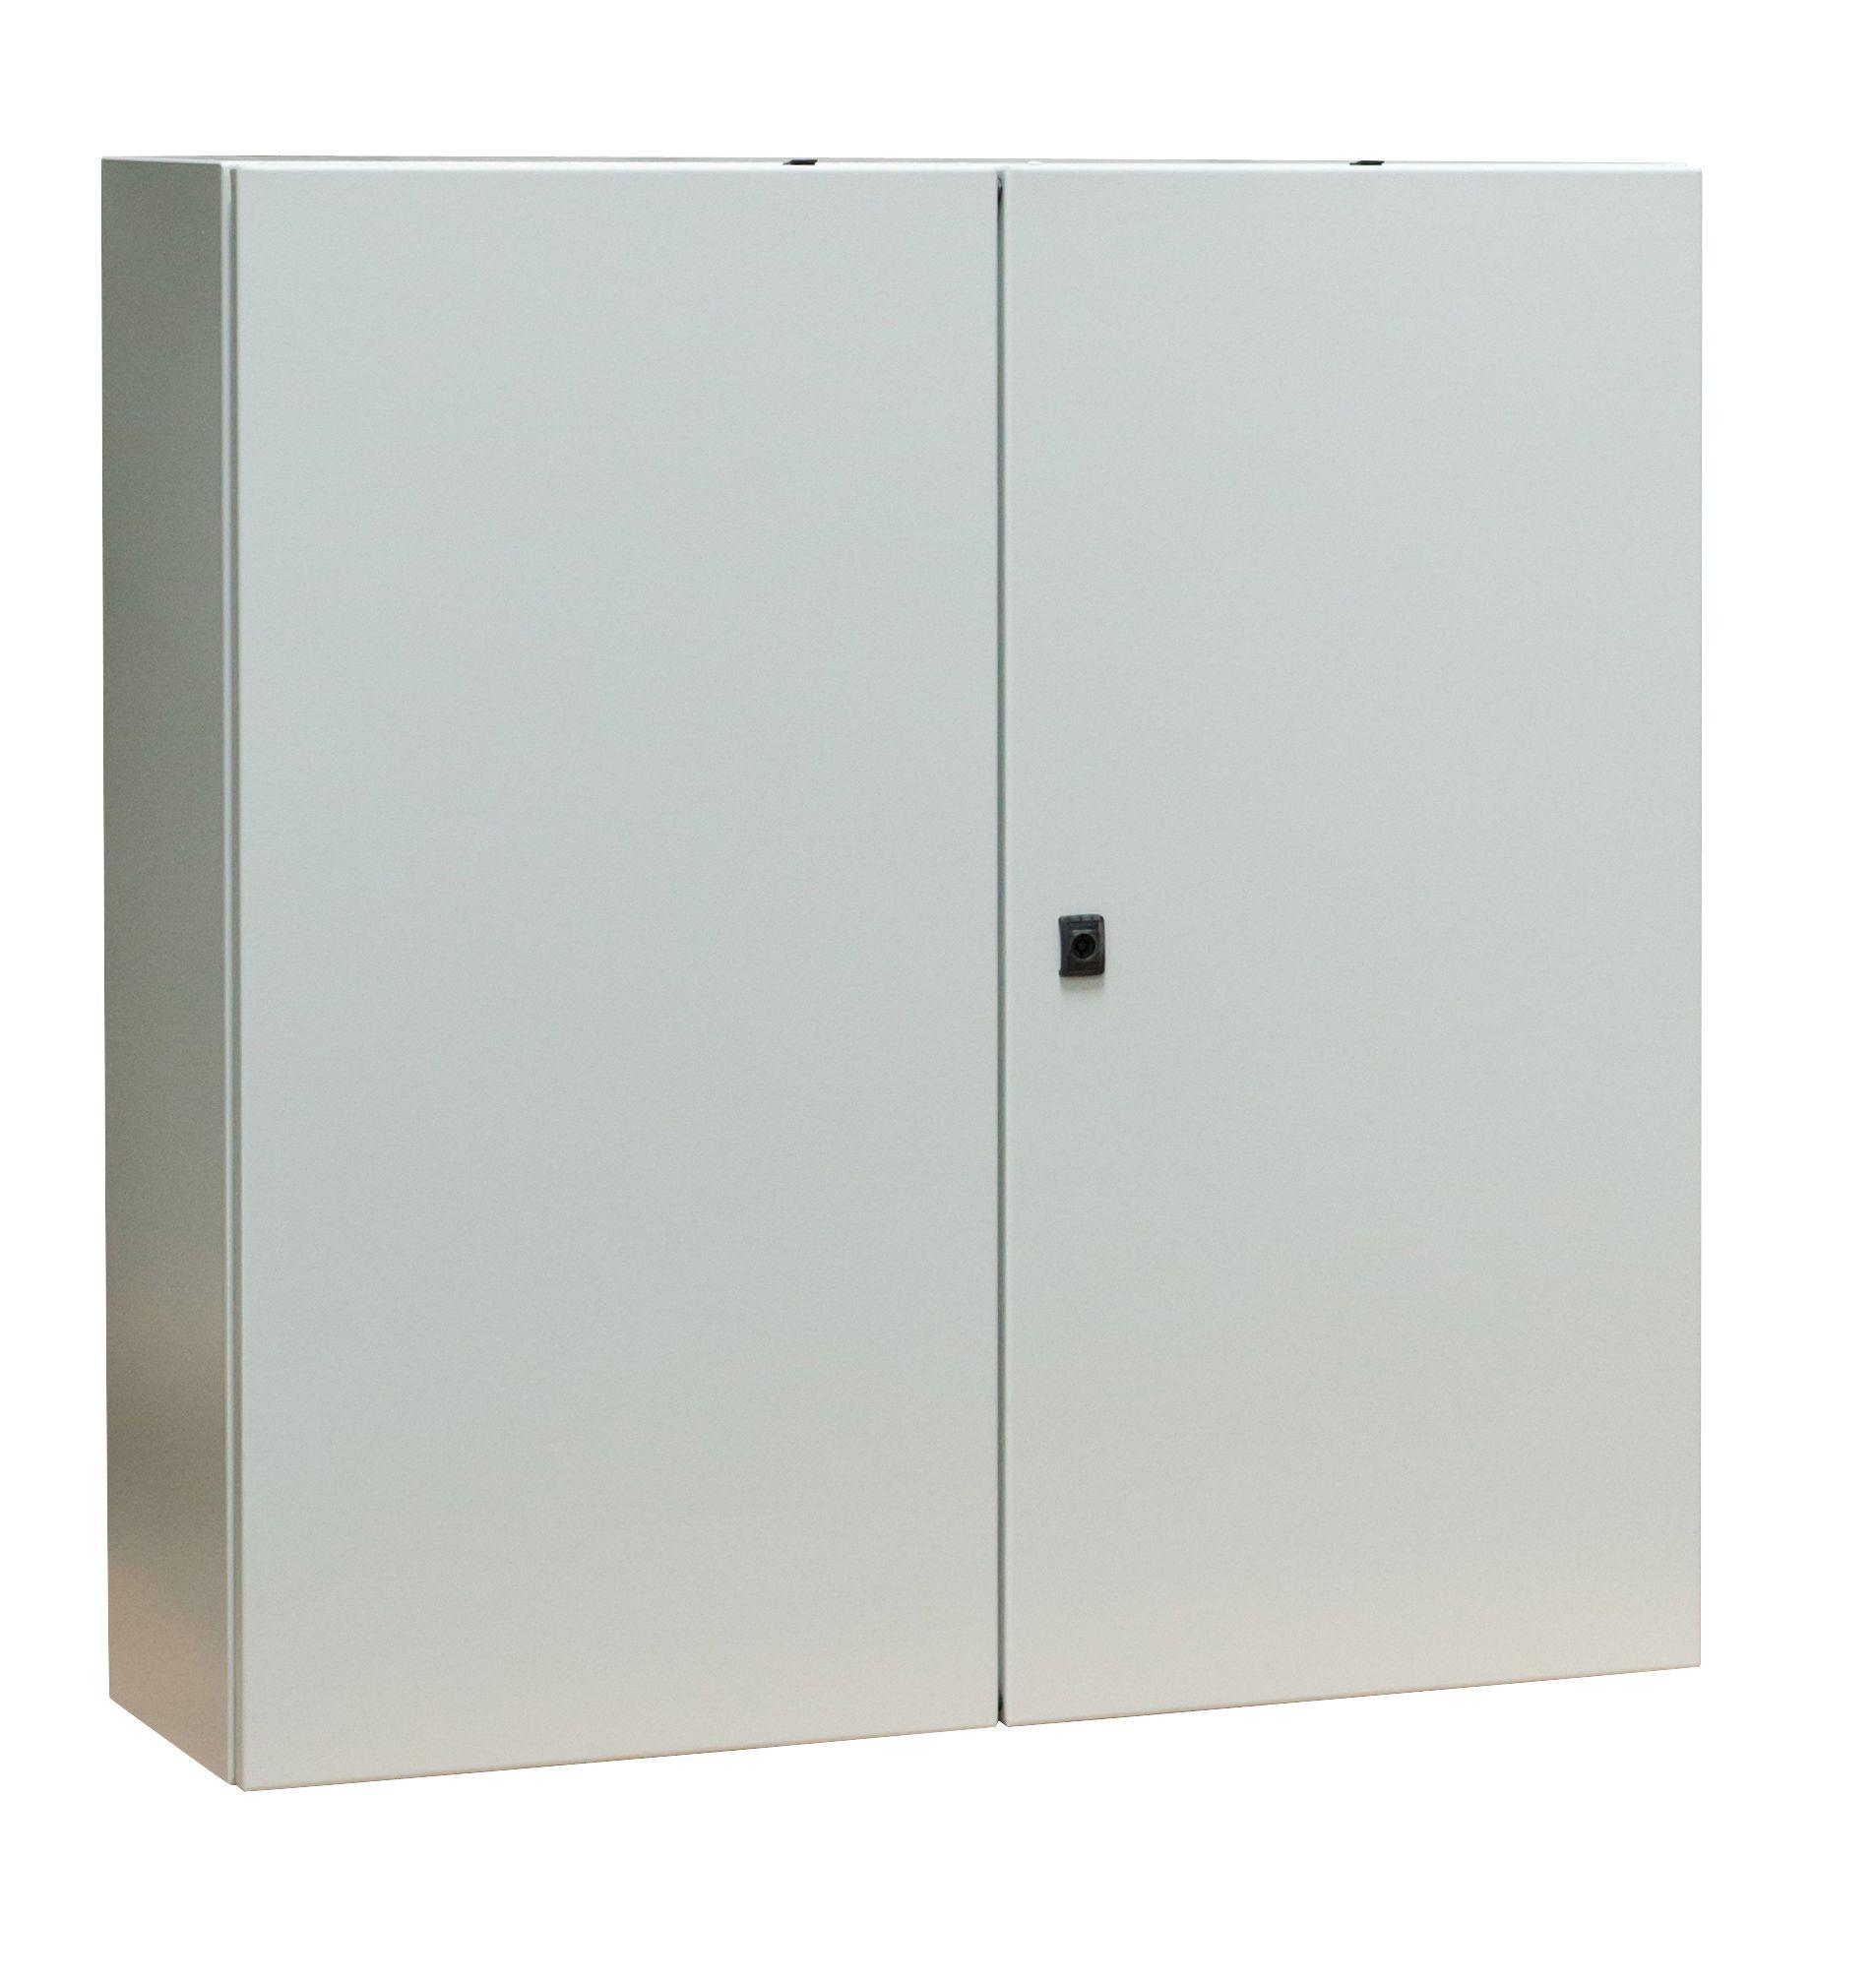 1 Stk Wandschrank Mono IP55 H=600 B=800 T=300 Stahlblech 2-türig WSM6080302